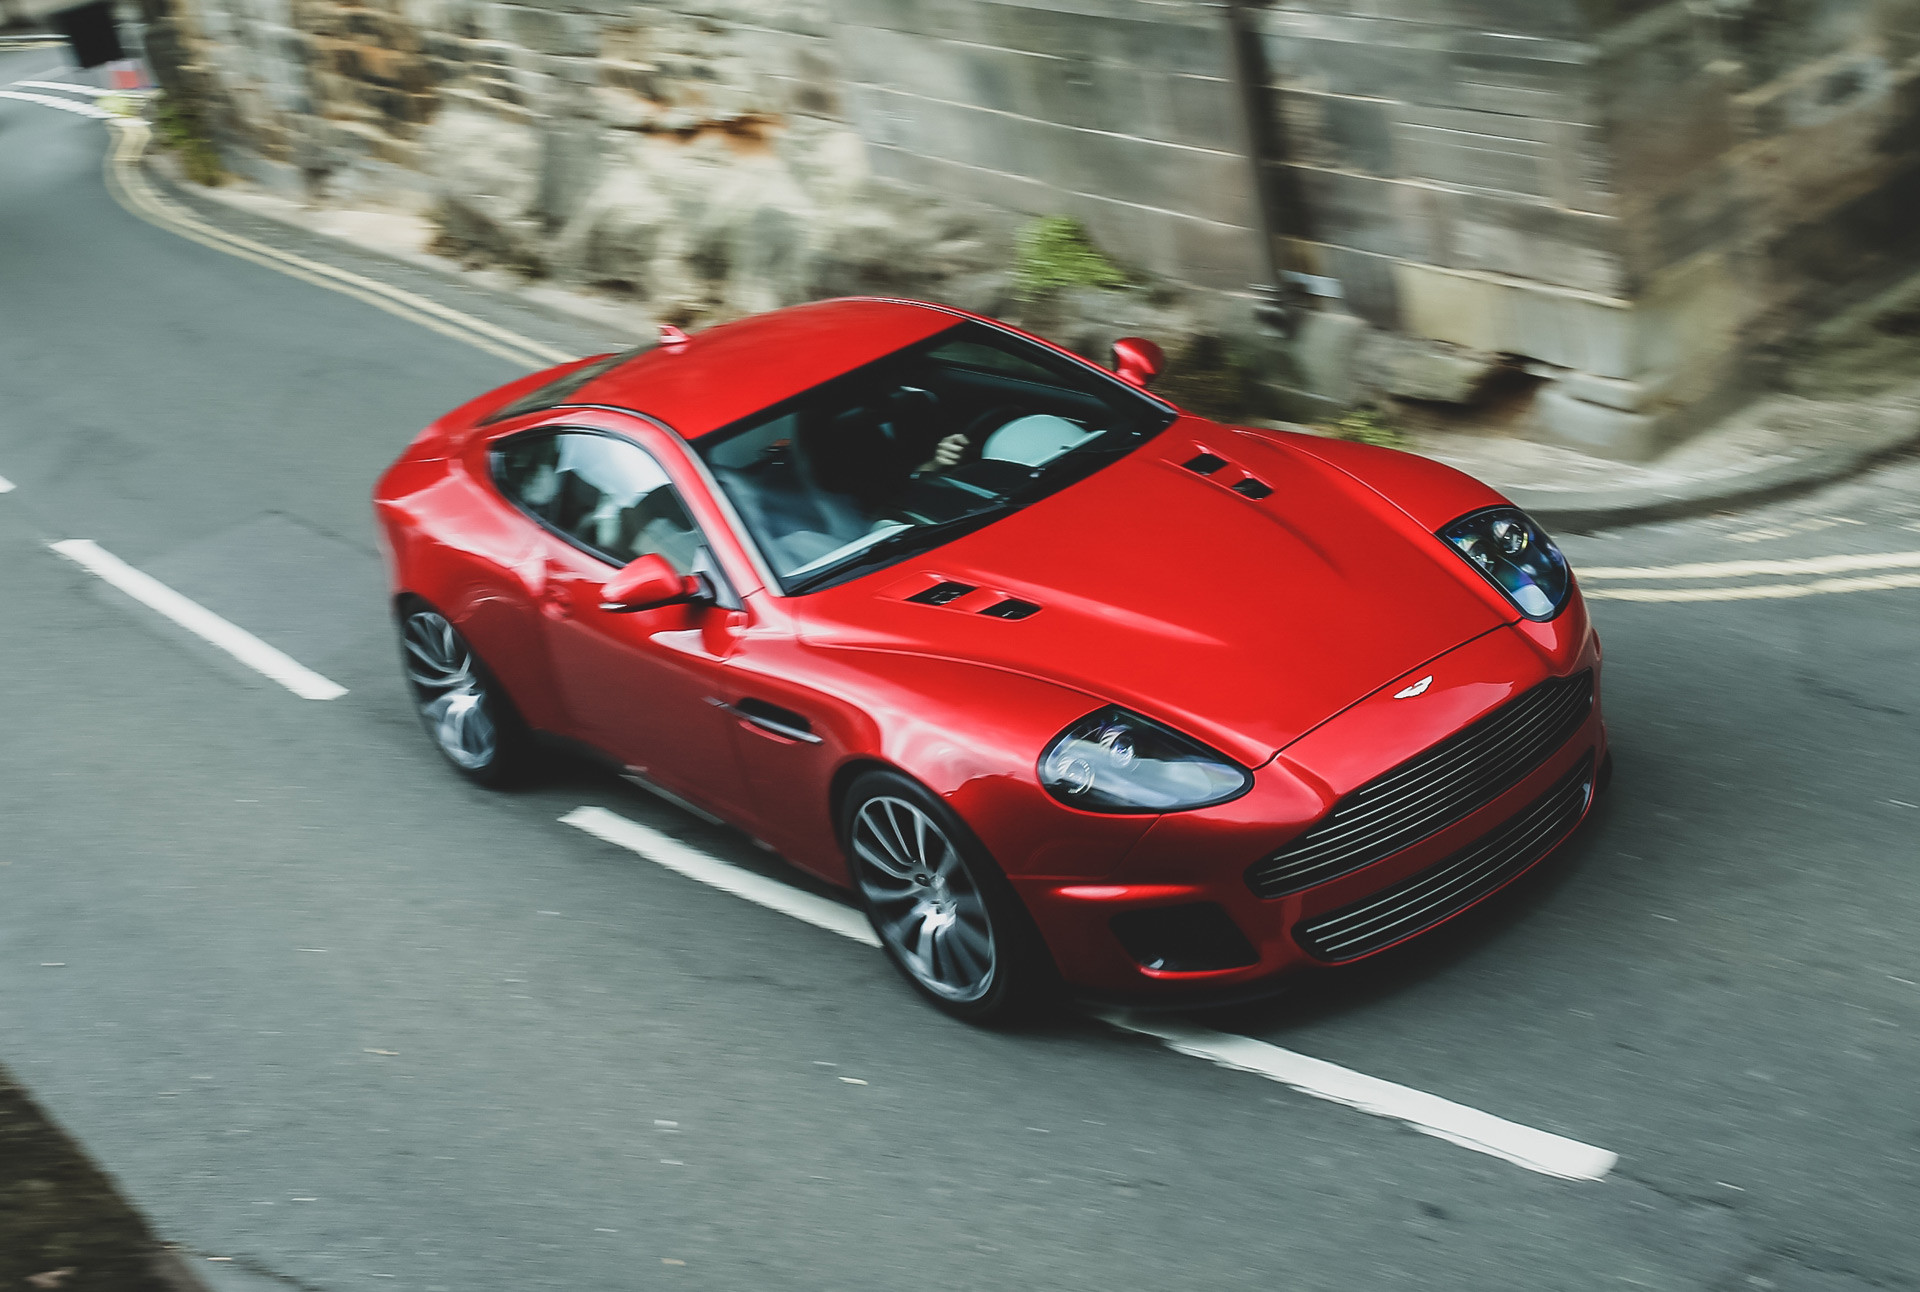 Aston Martin Vanquish Callum 25 by R-Reforged